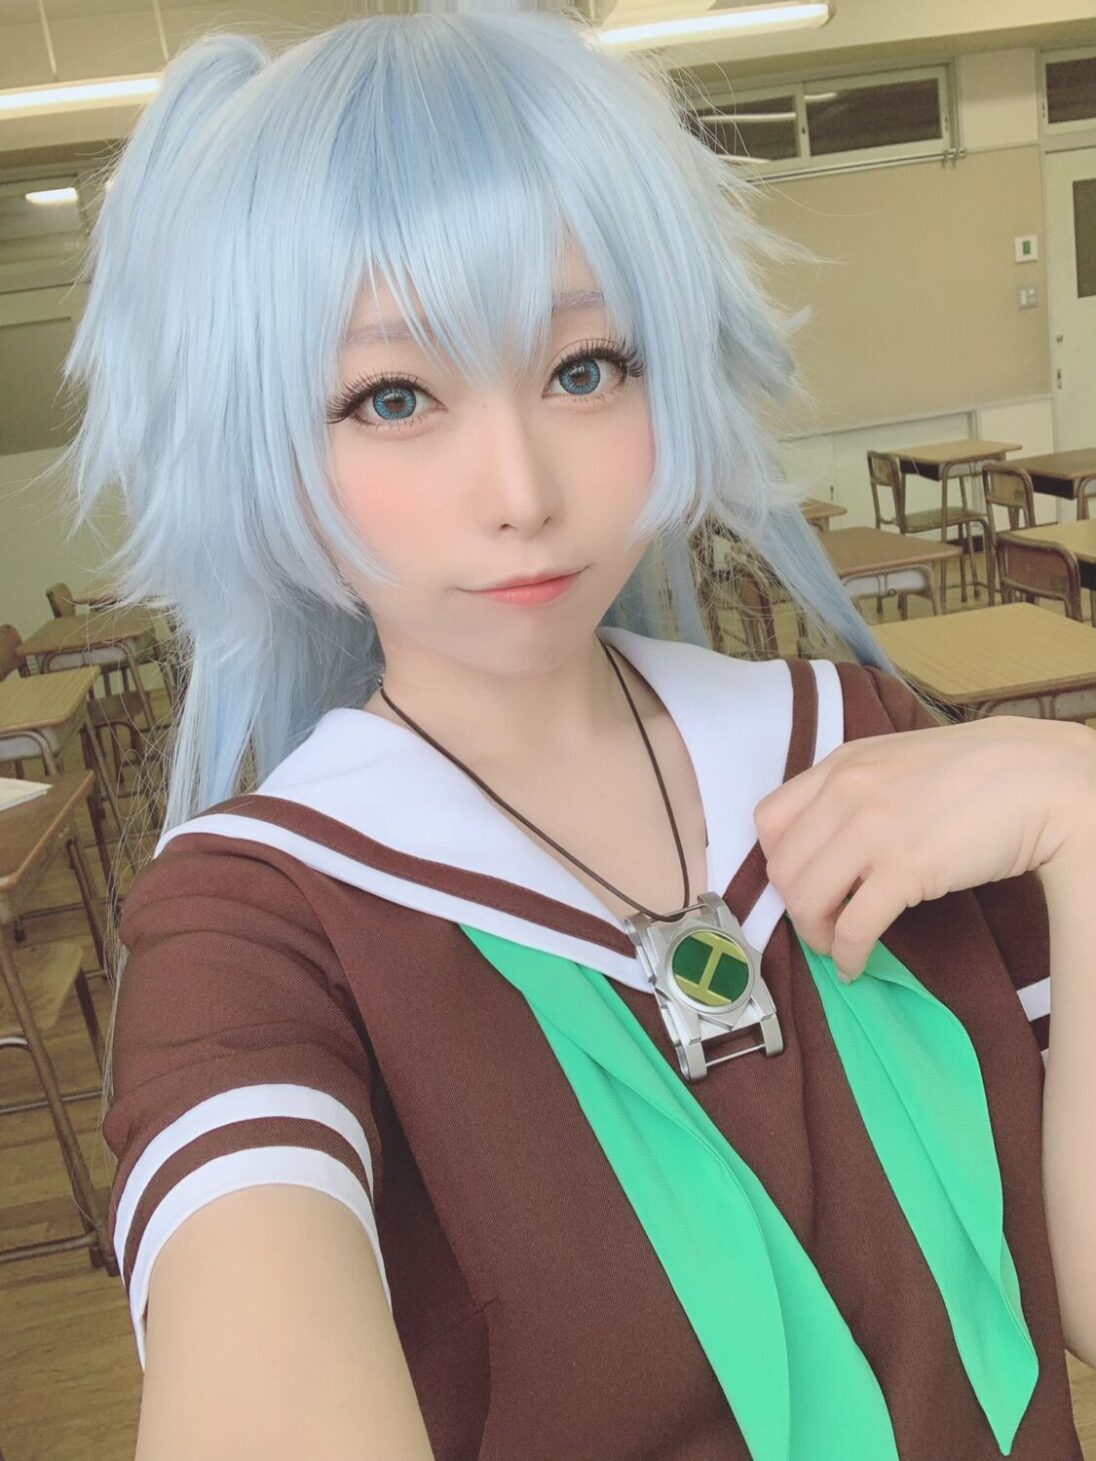 Dokyuu Hentai HxEros